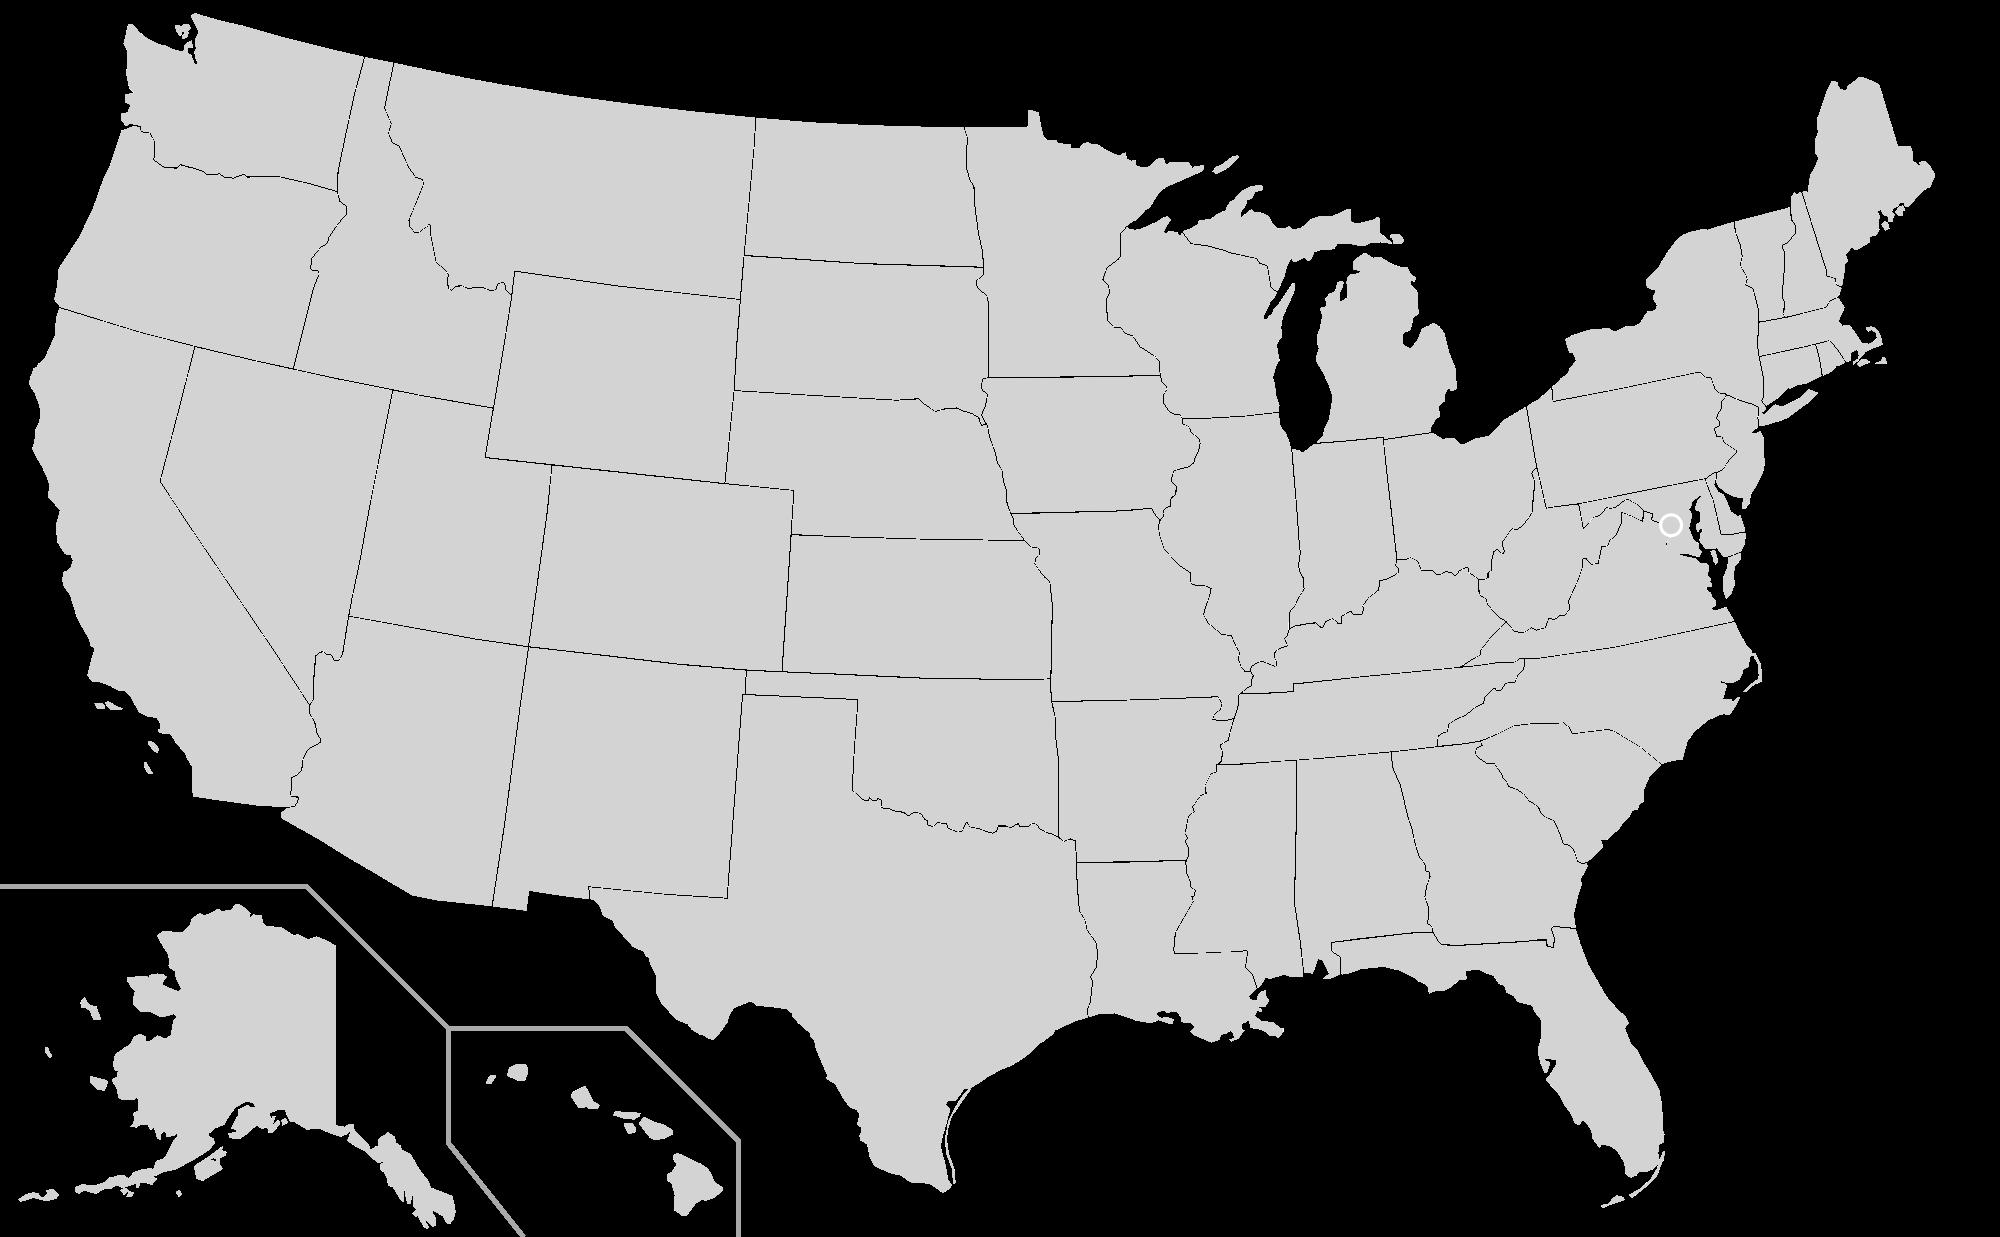 Towing in Baltimore Map